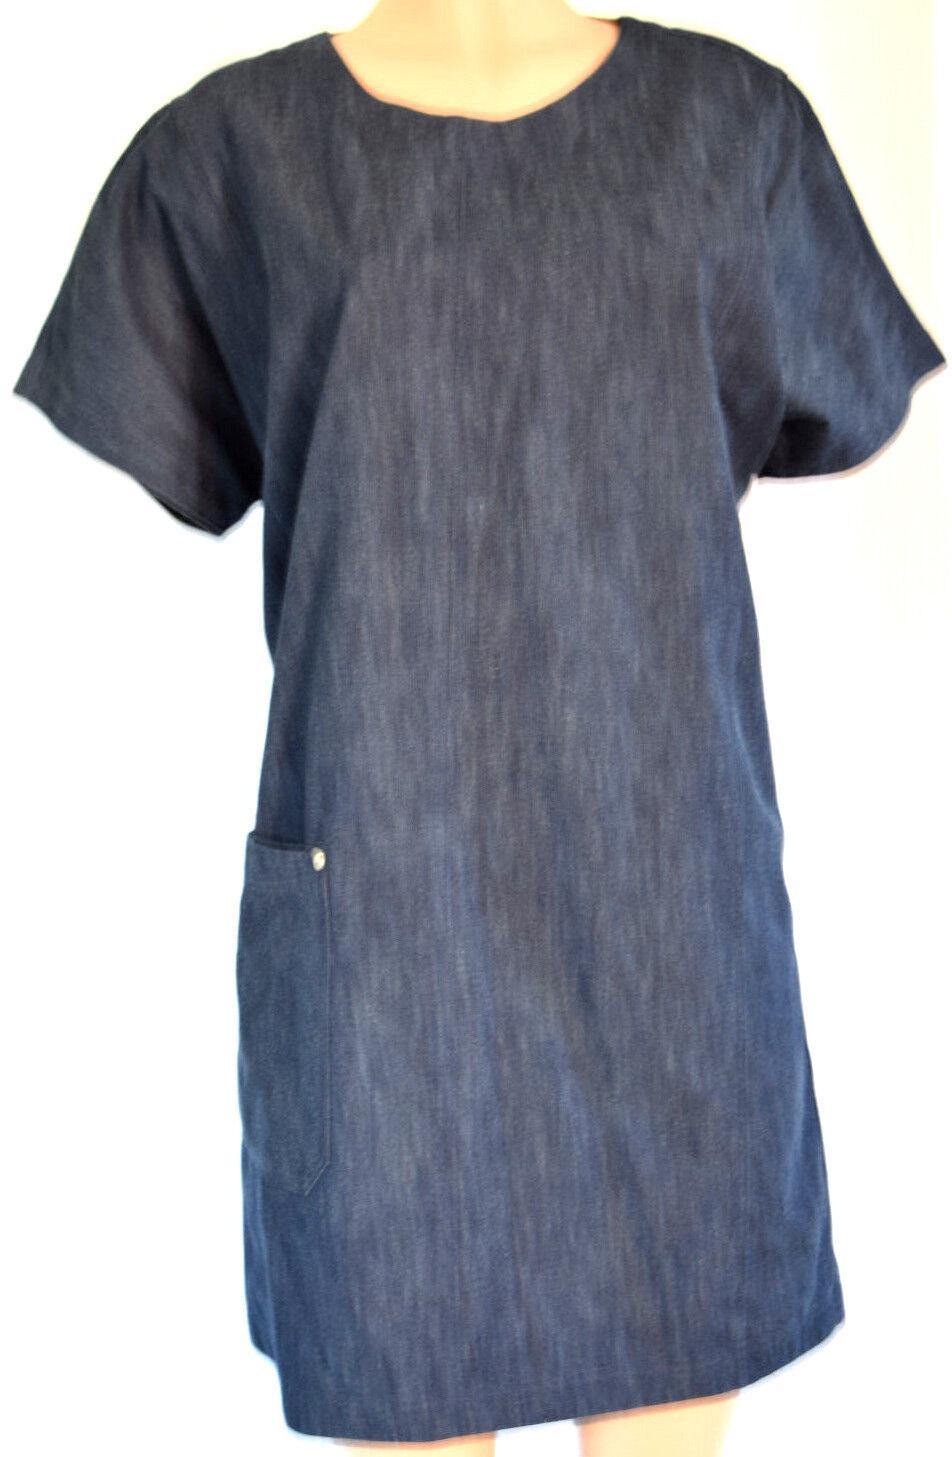 Reg & Bone Azul Denim Mangas Cortas Vestido Túnica Talla  Grande  oferta especial